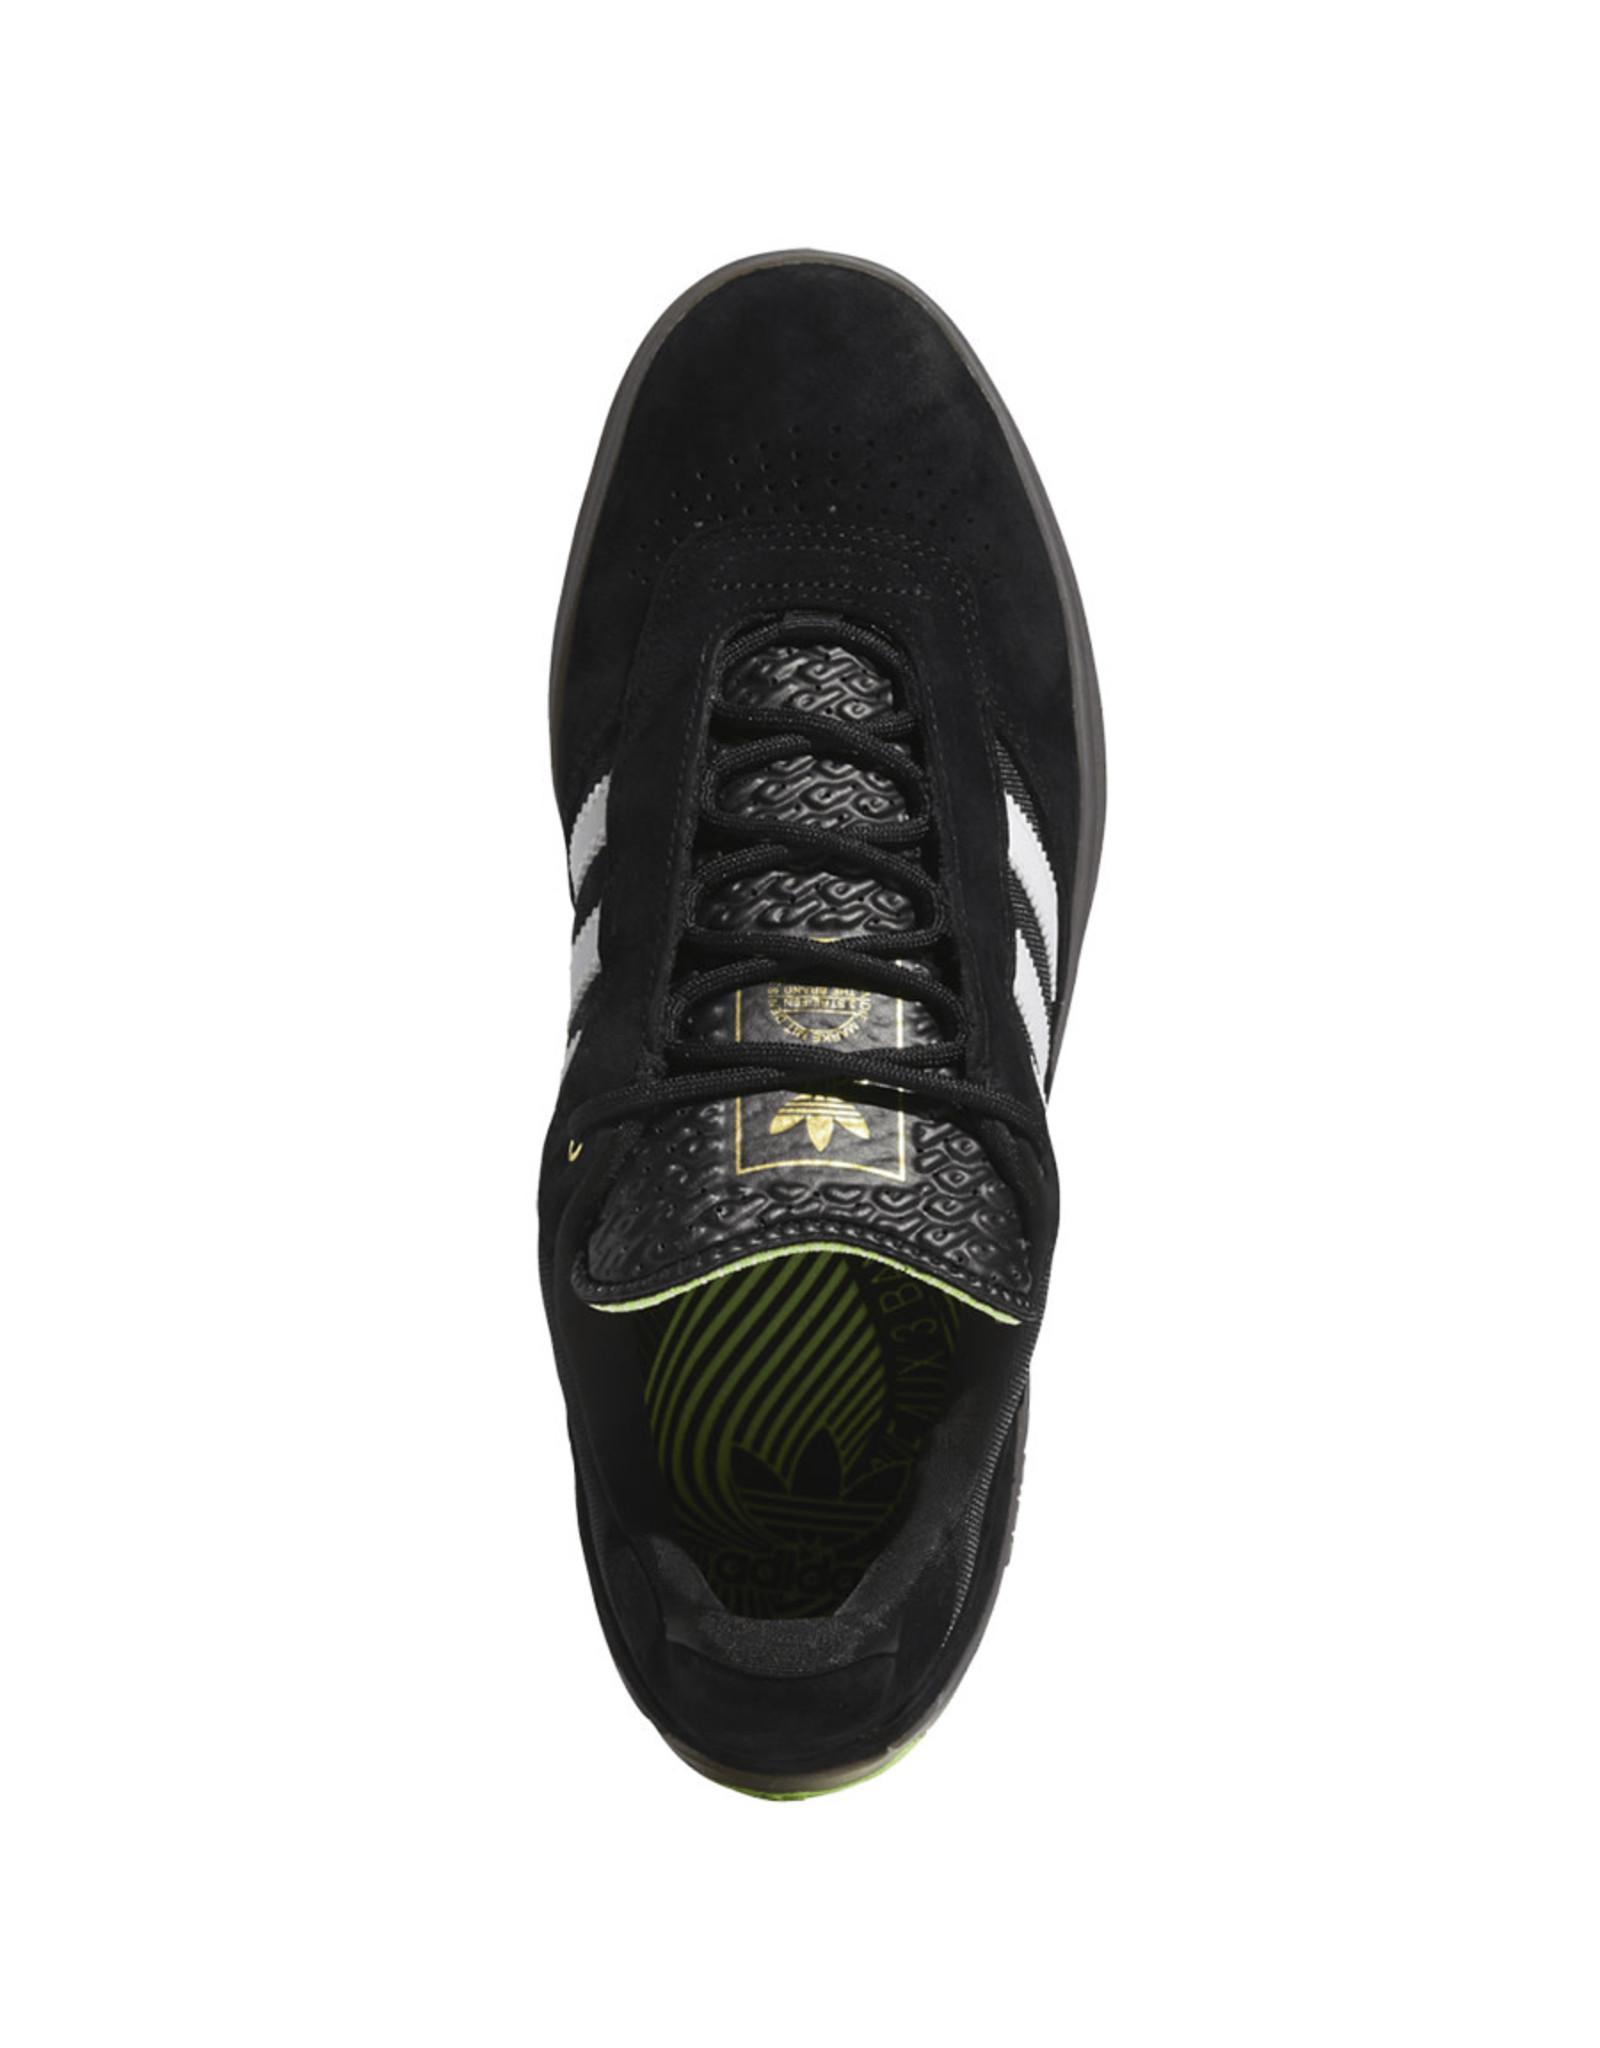 Adidas Adidas Shoe Lucas Puig (Black/White)